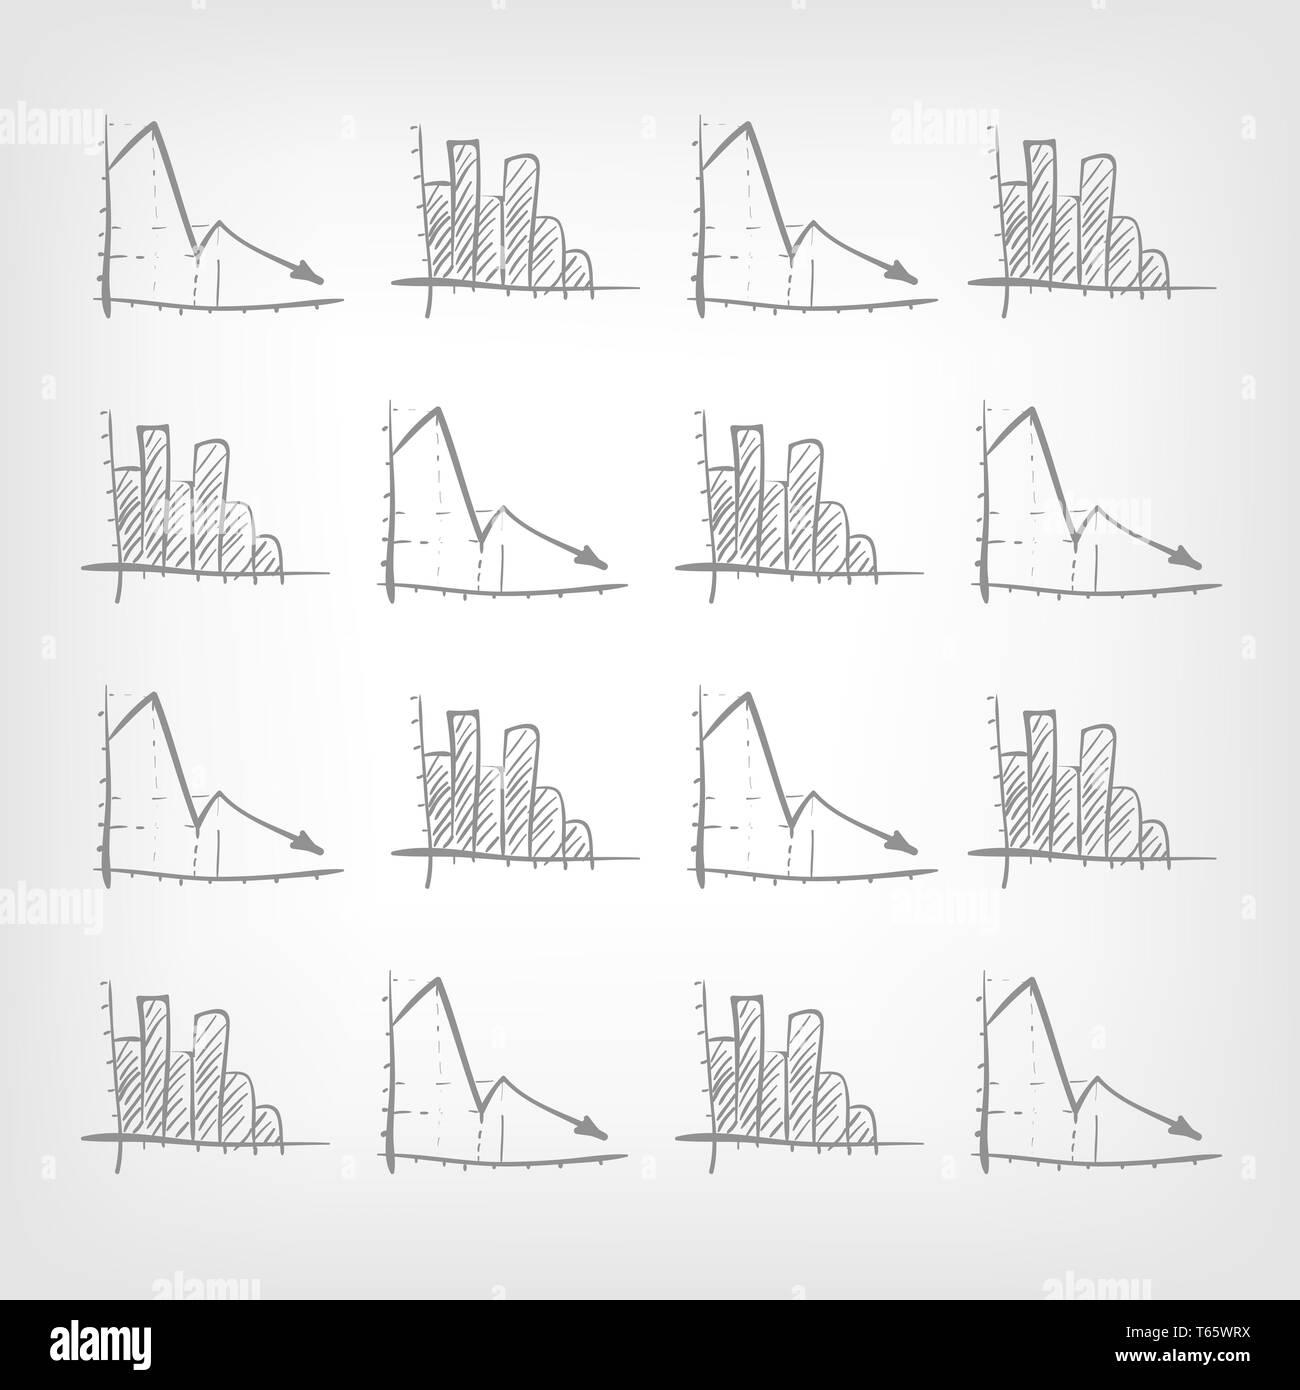 Graph Down - Stock Image